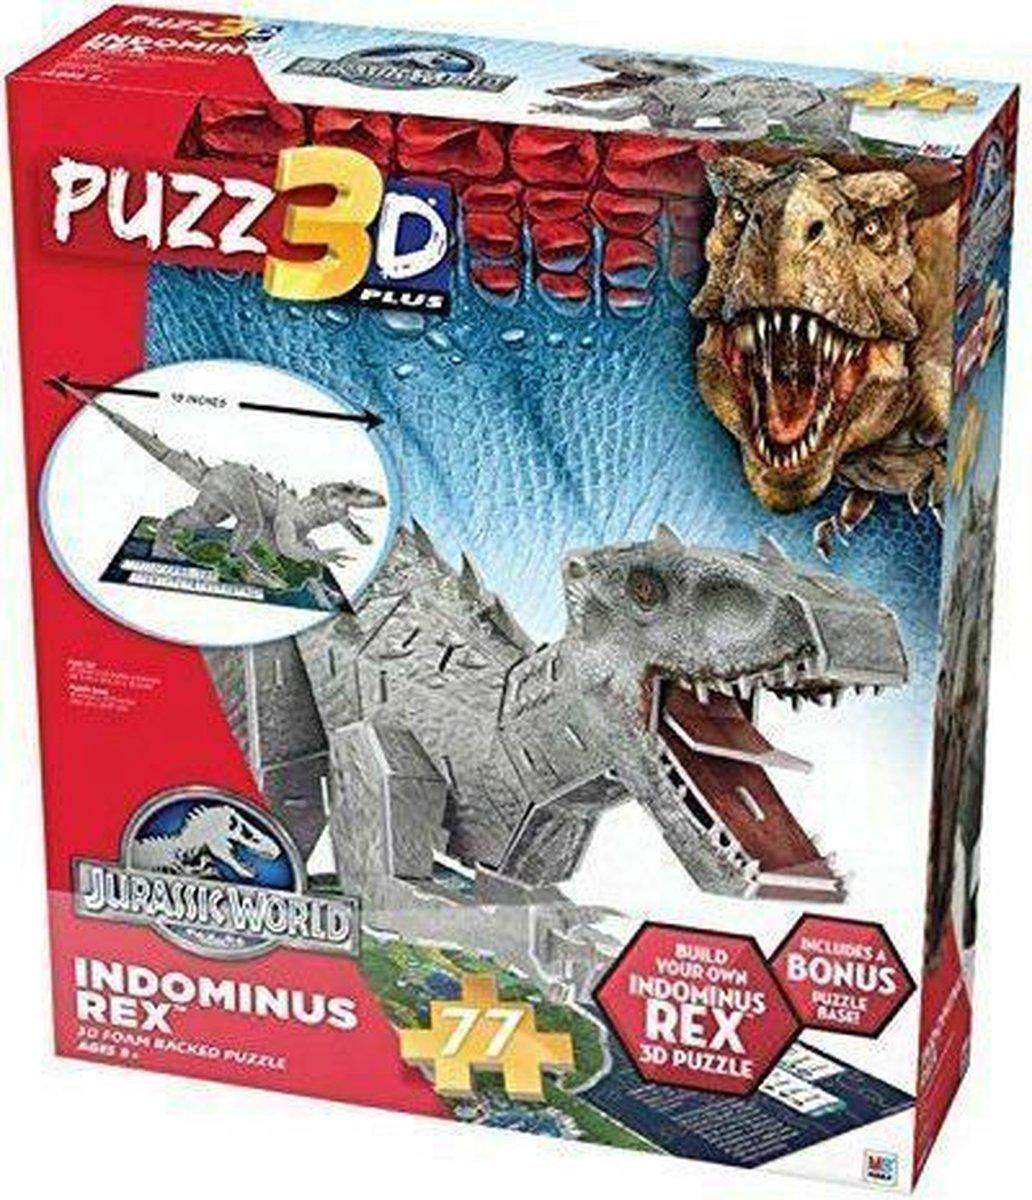 Jurrasic World-3D puzzel-Indominus Rex-77 stukjes